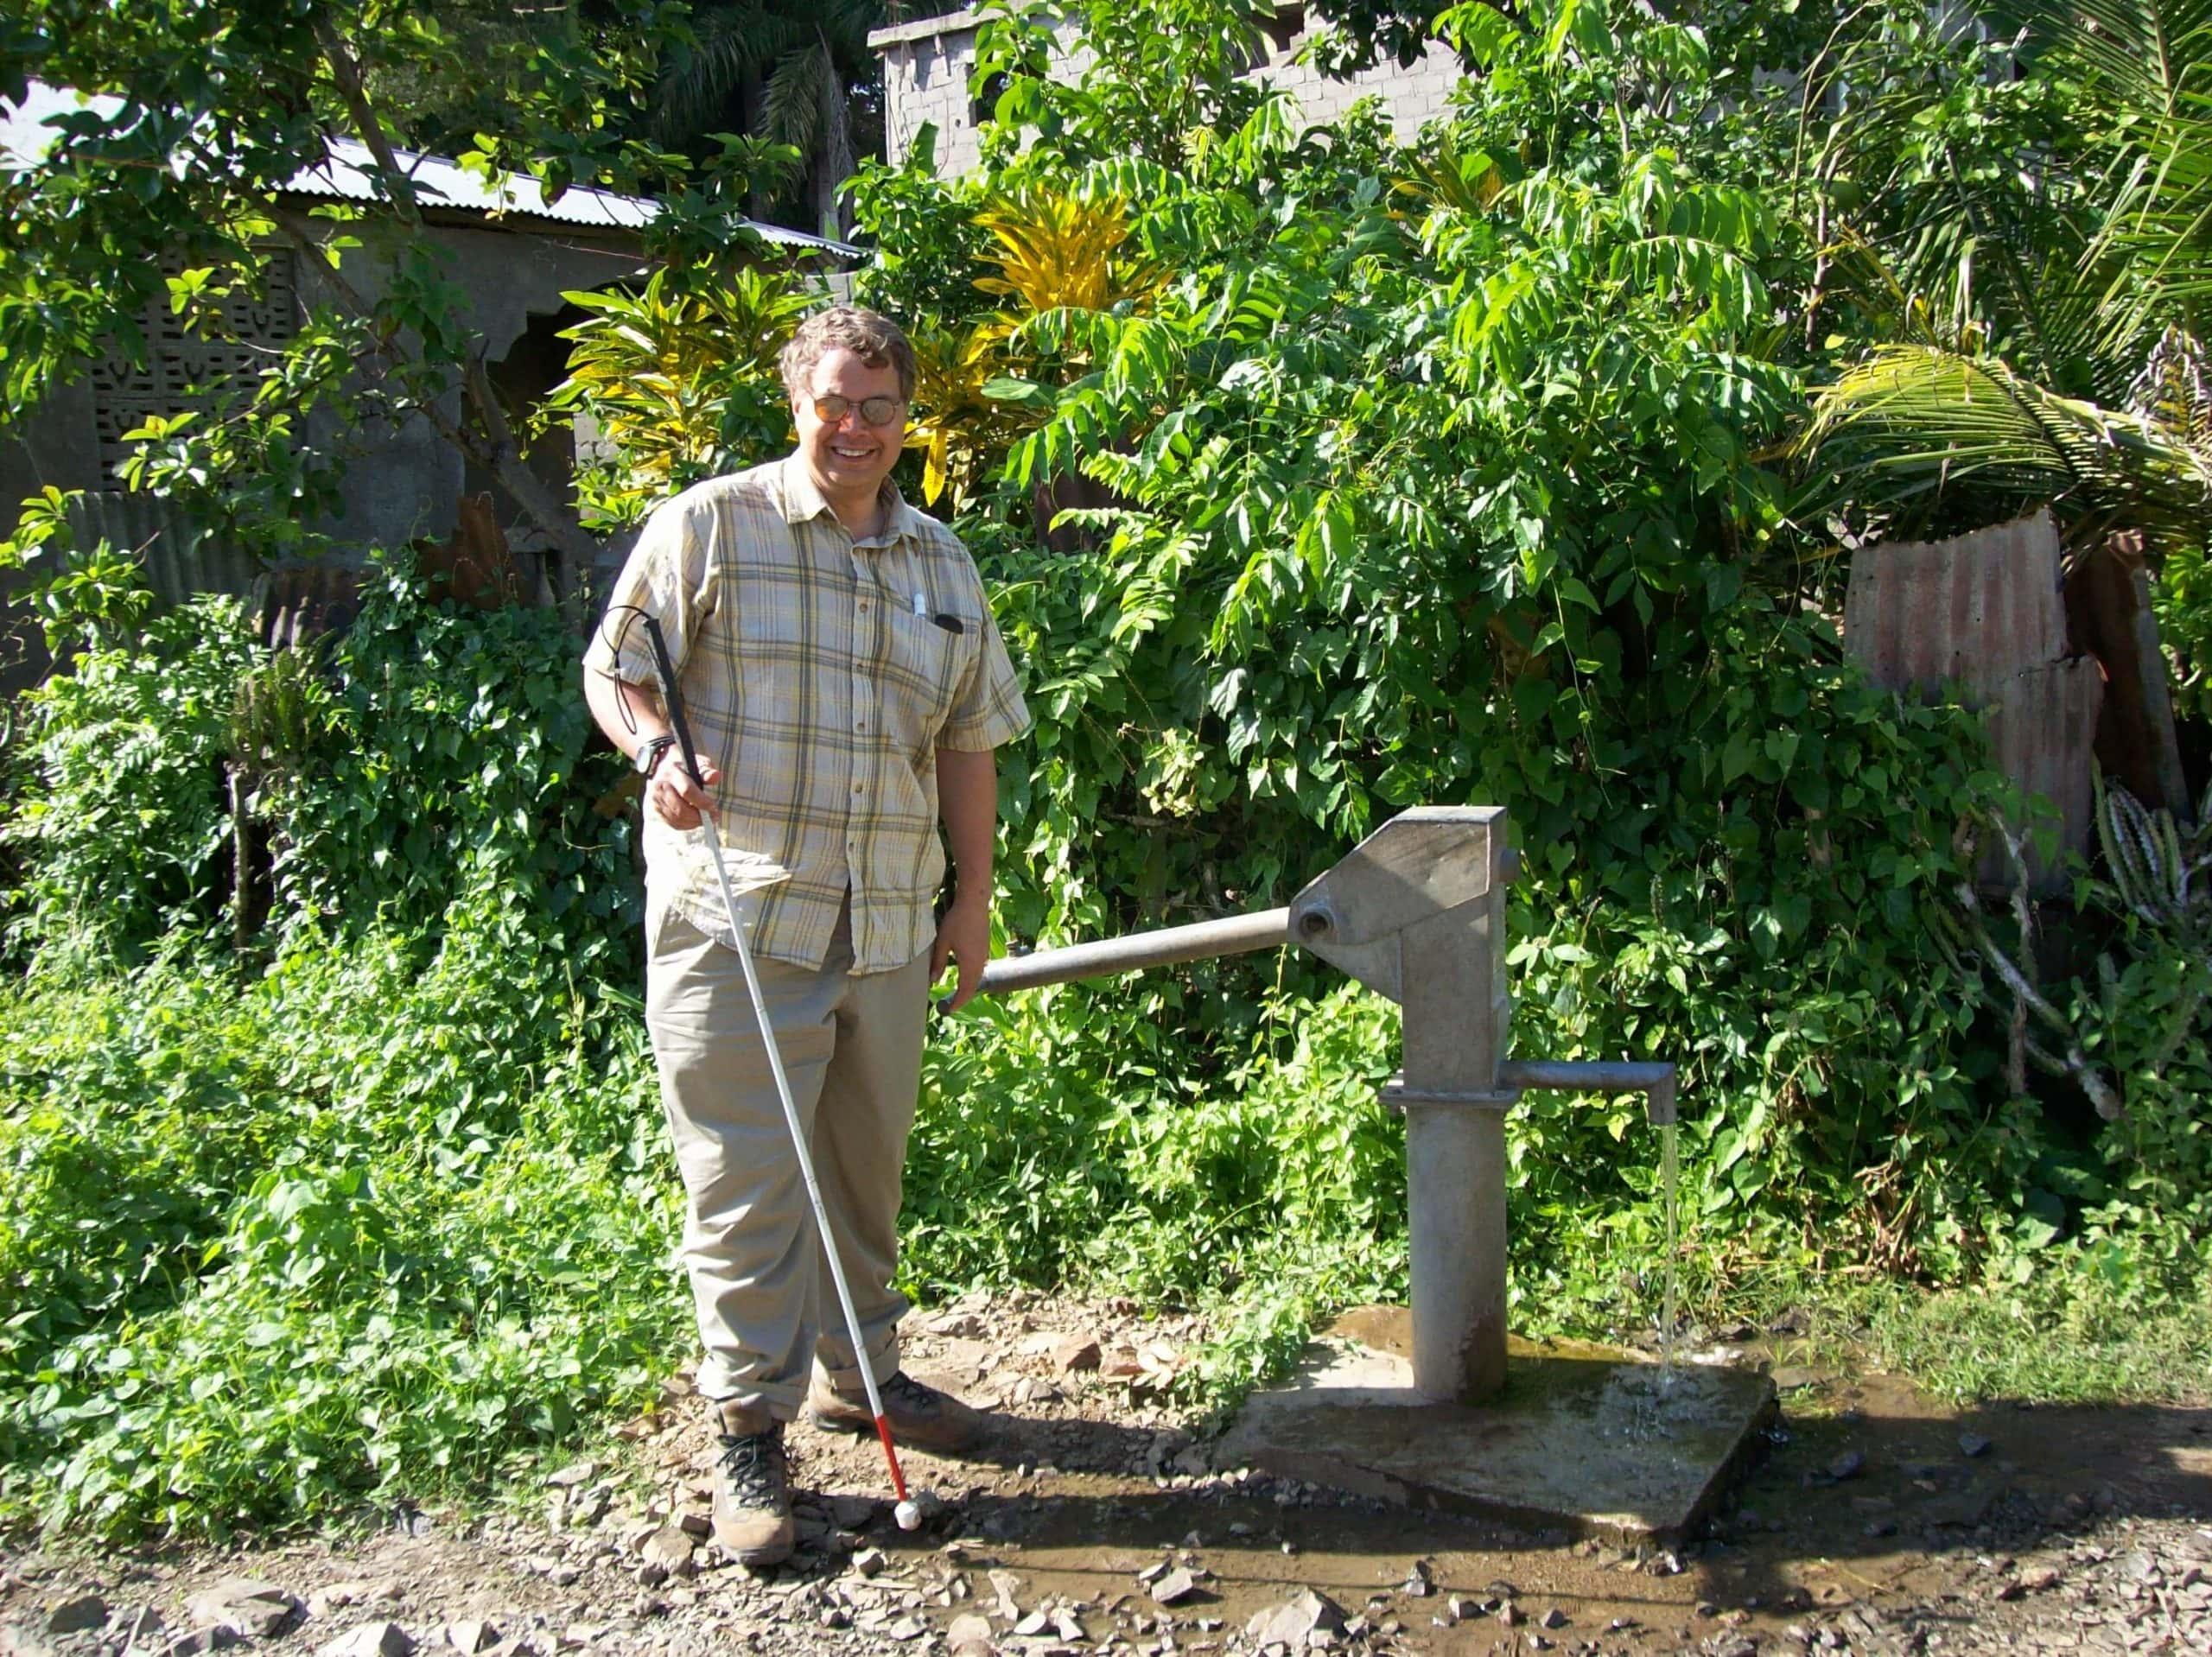 Man standing at water pump